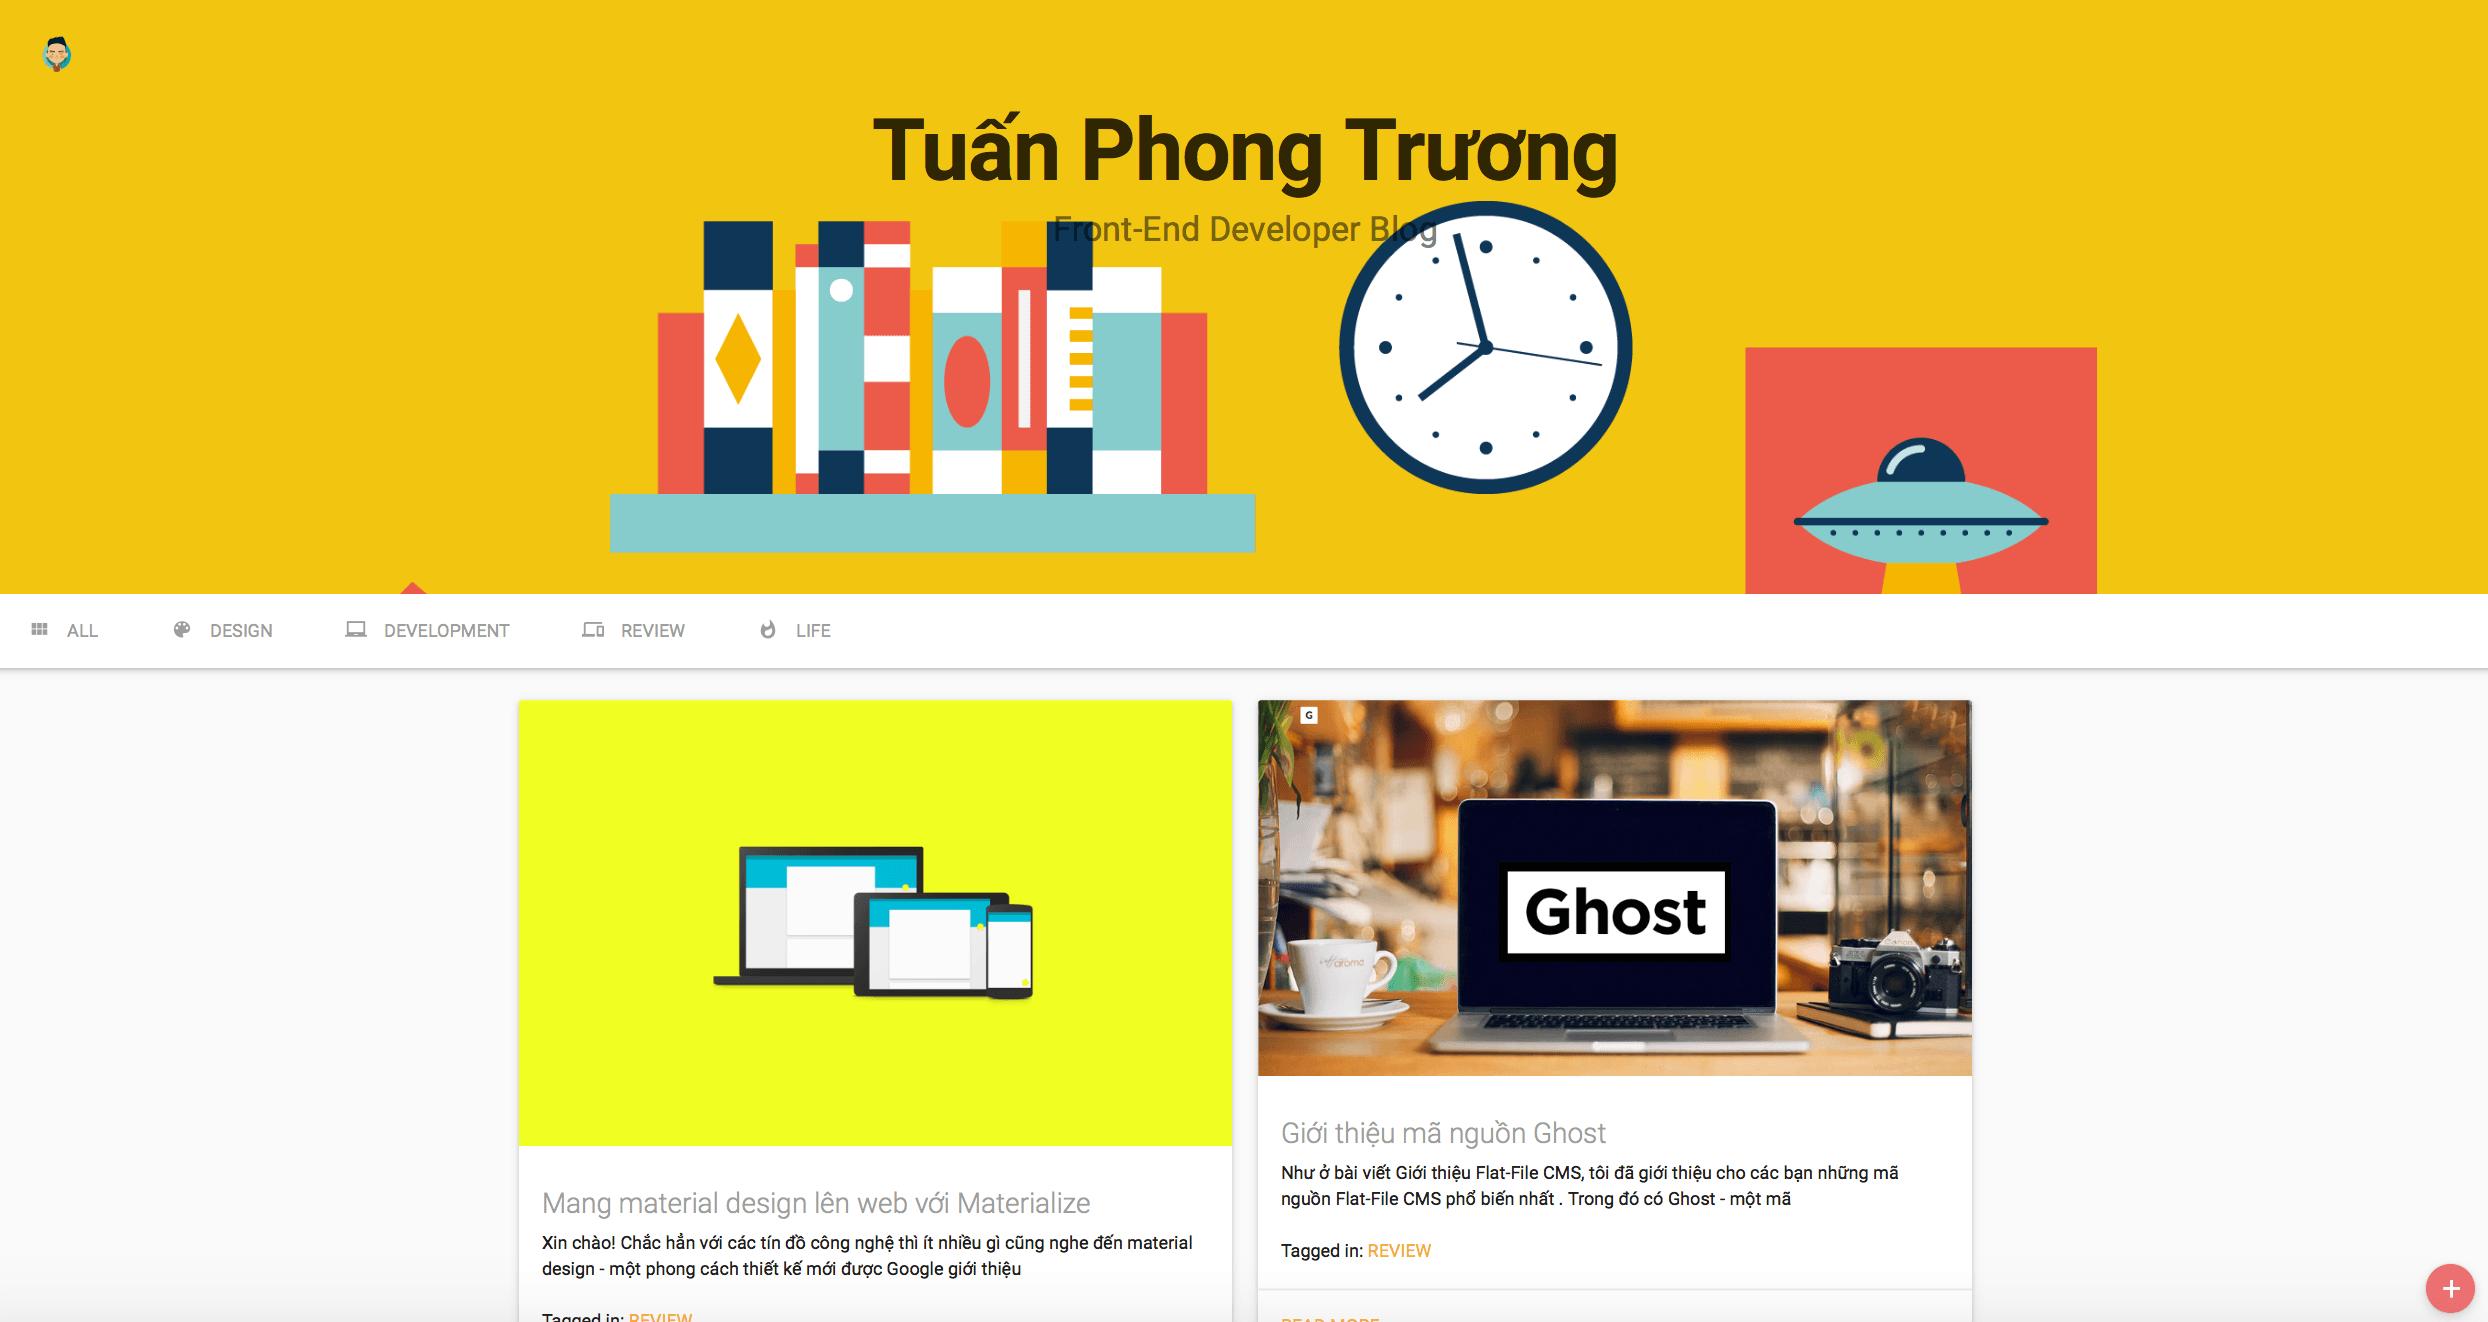 Material design based, portfolio website by Tuấn Phong Trương